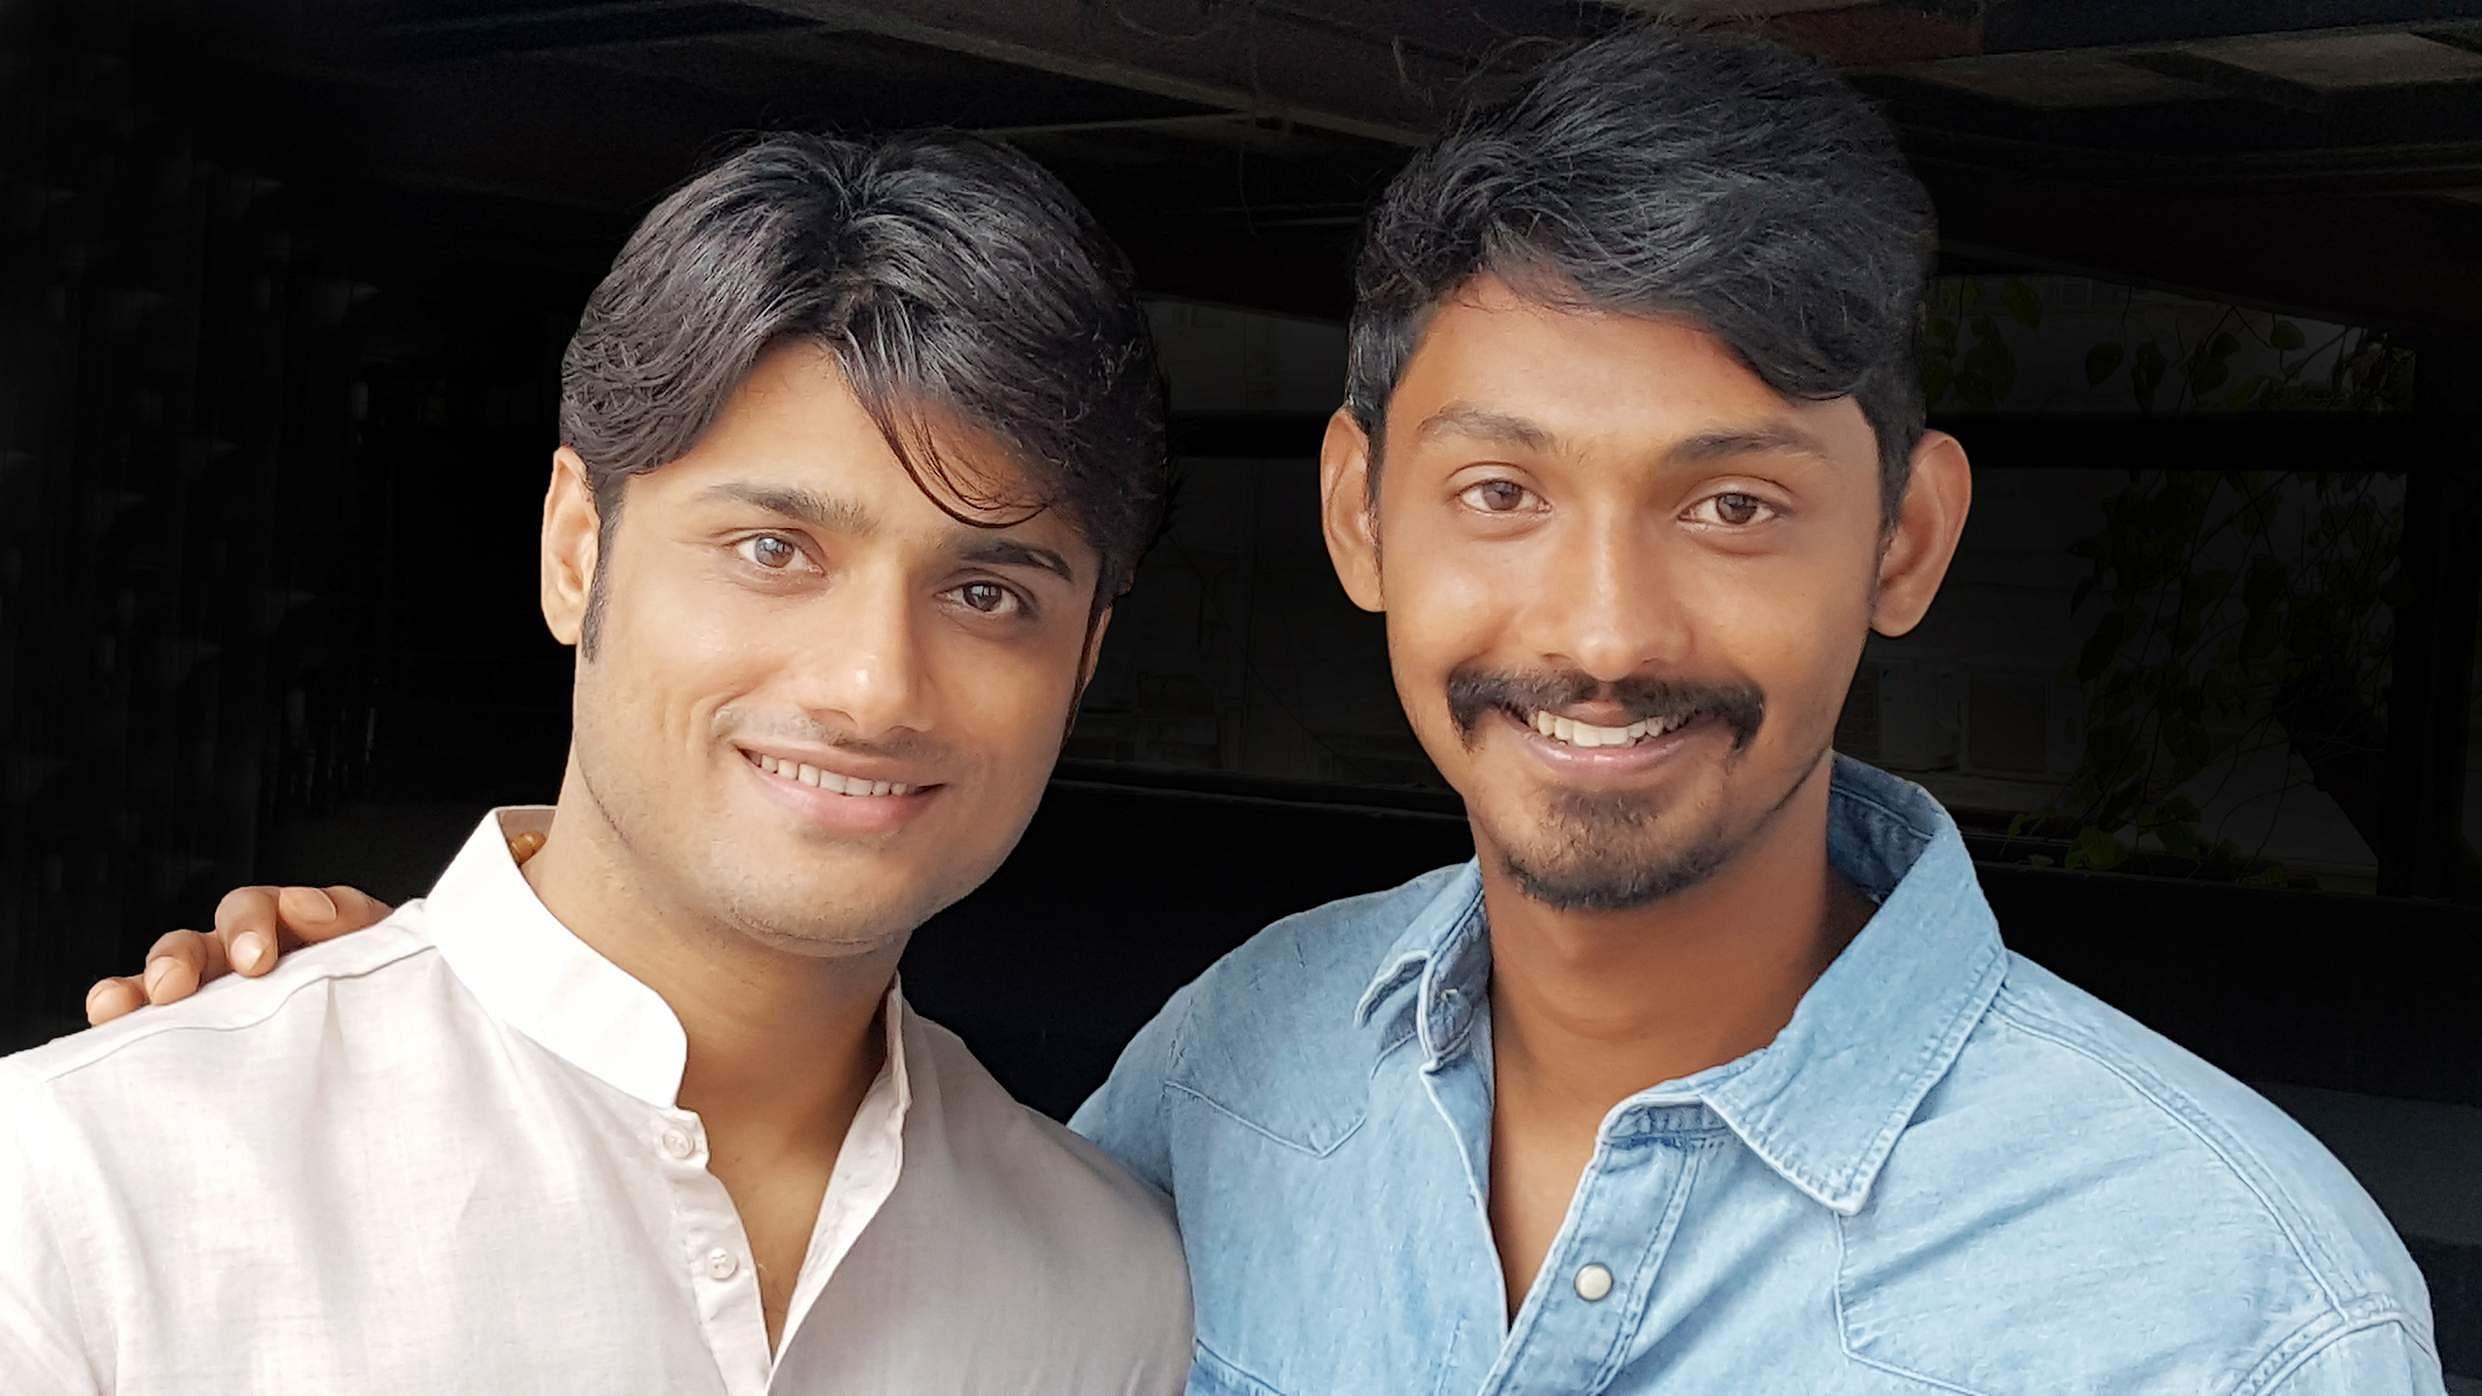 Producer Sandeep Singh and director Elan